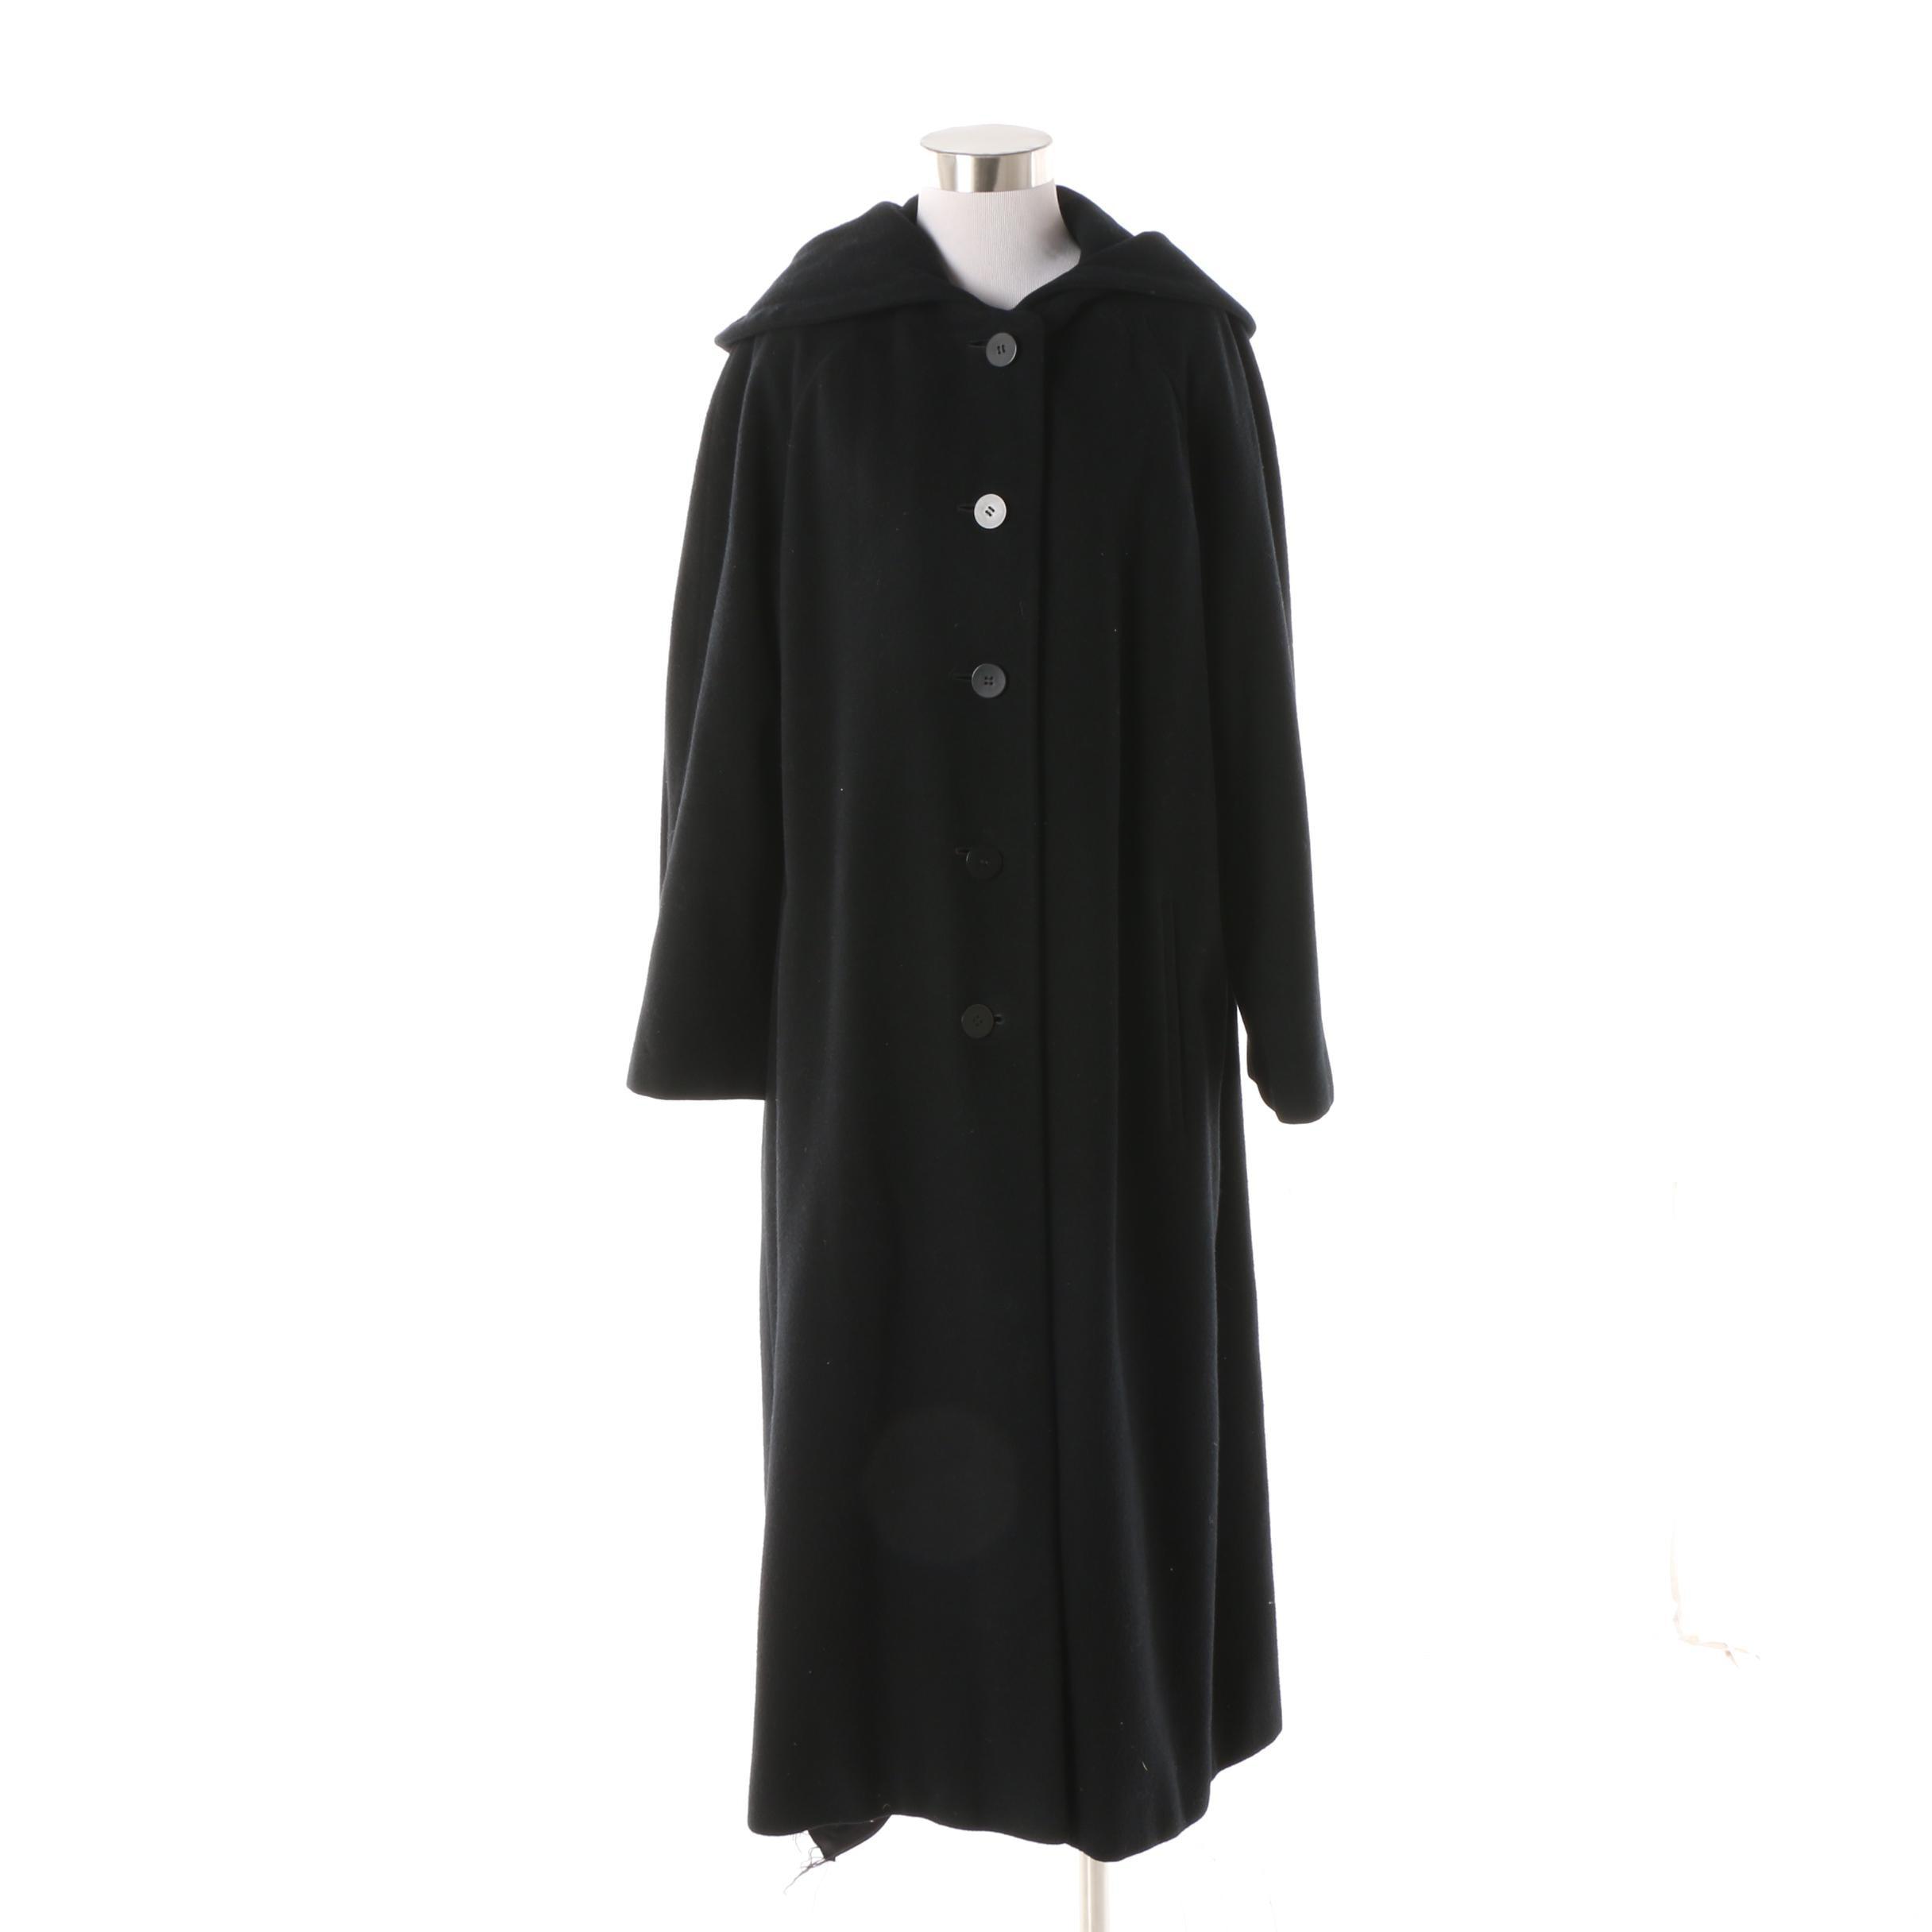 Circa 1990s Regency Oversize Cashmere Black Cashmere Hooded Coat